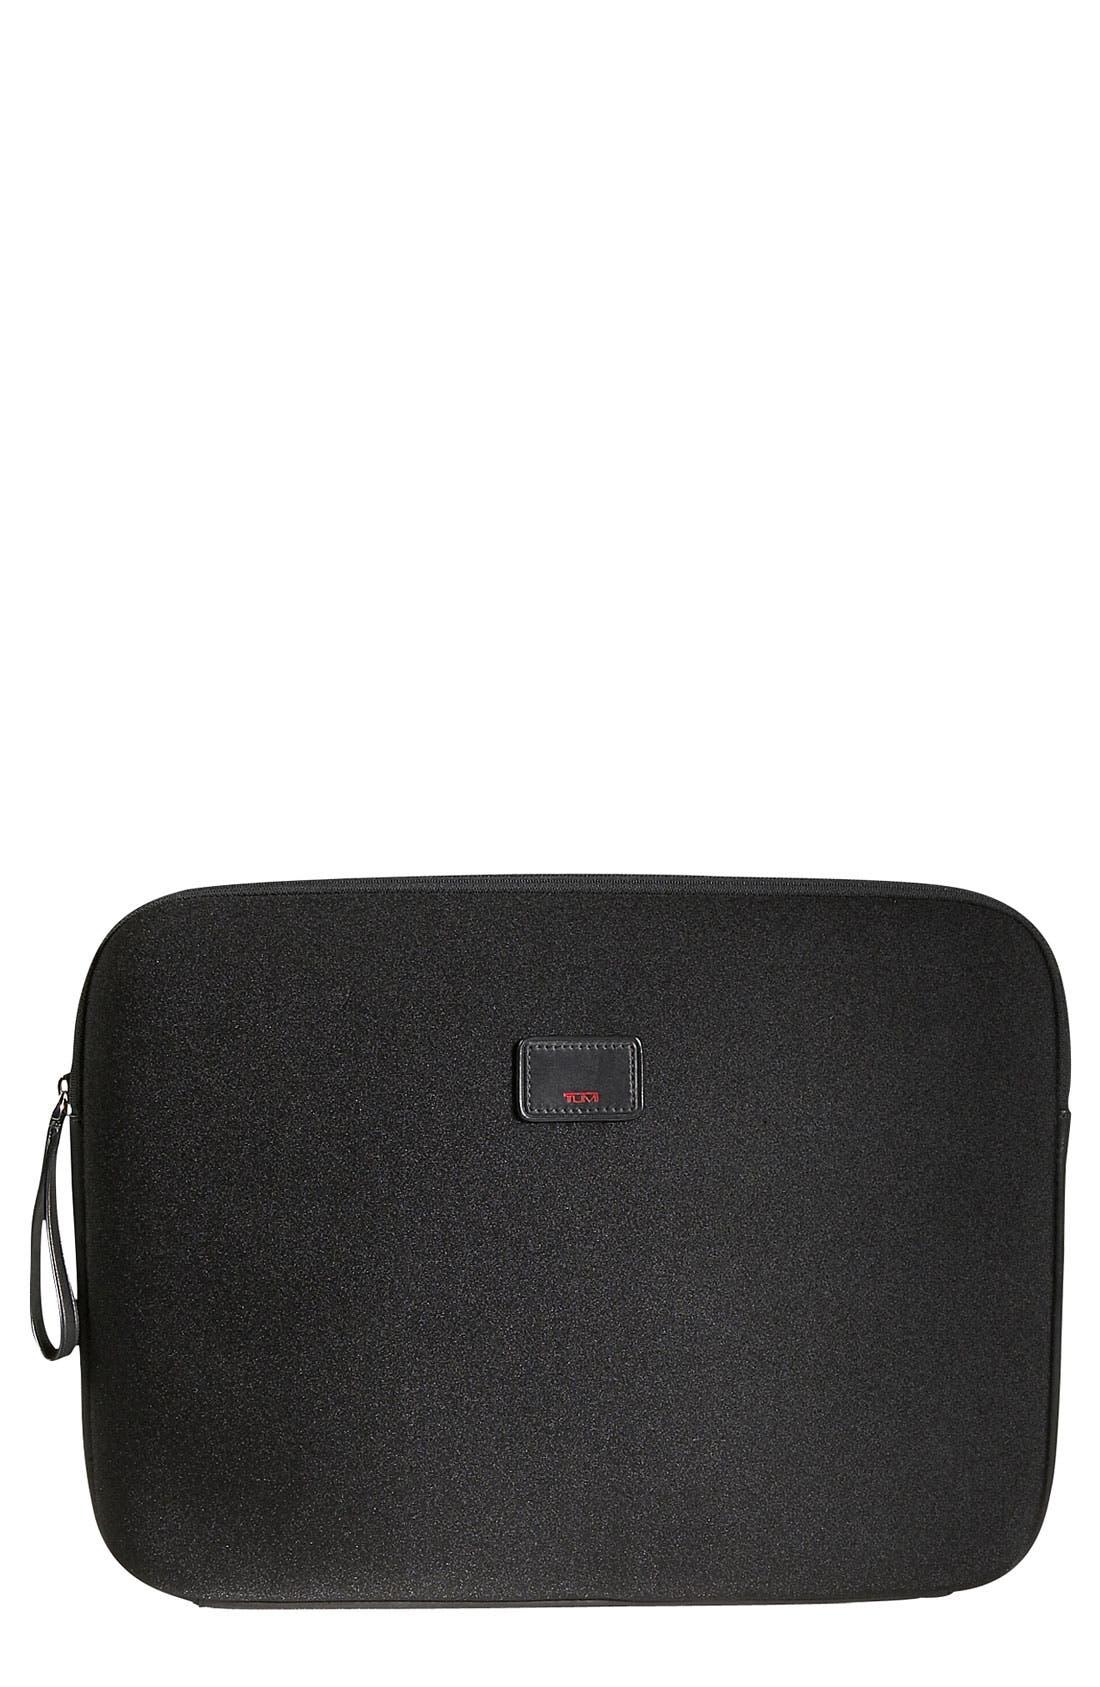 Main Image - Tumi 'Alpha - Medium' Laptop Cover (15 Inch)